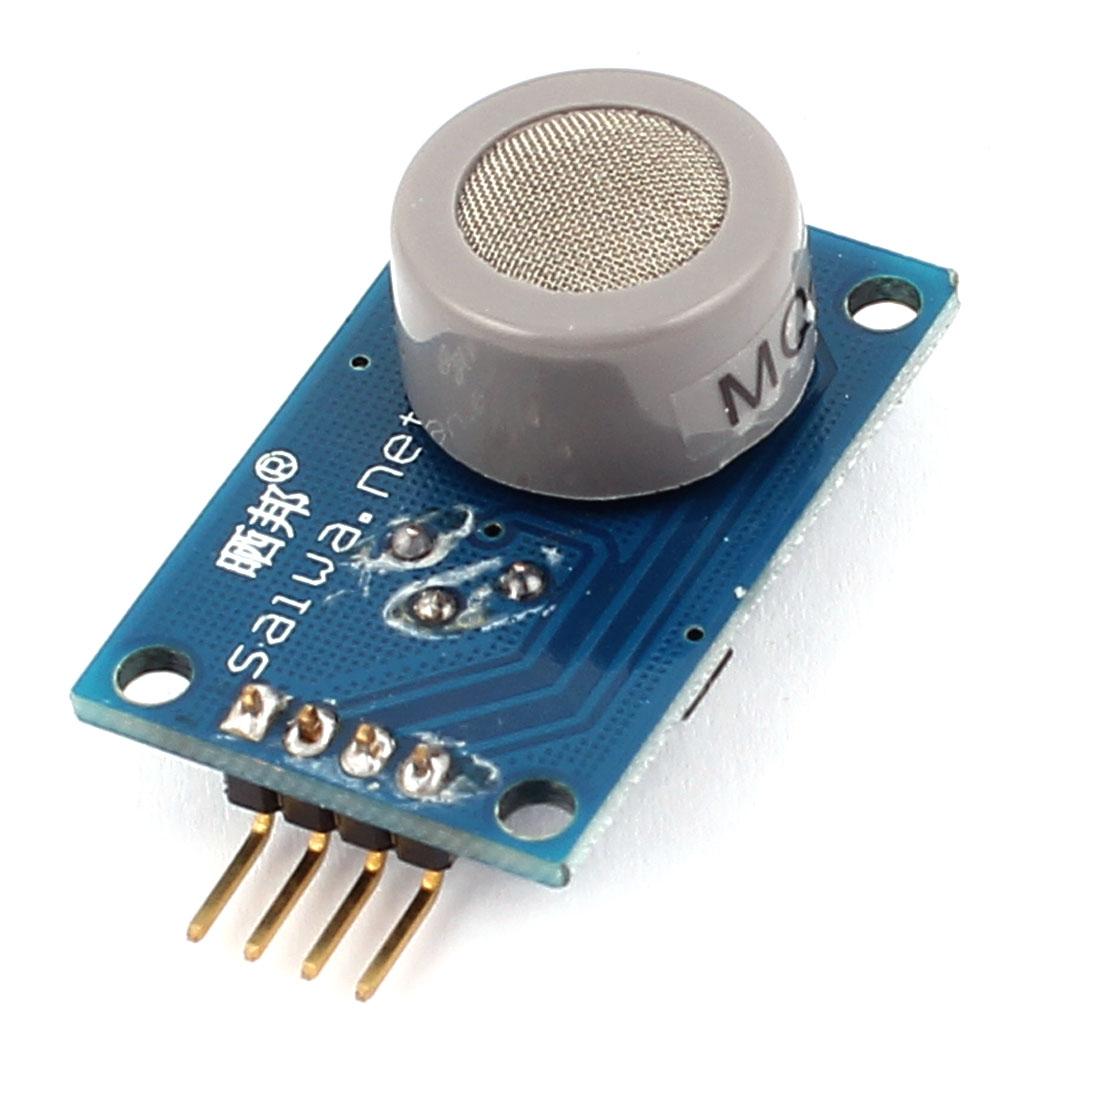 DC 3-5V Carbonic Oxide Gas Sensor Alarm Module Detector MQ-9